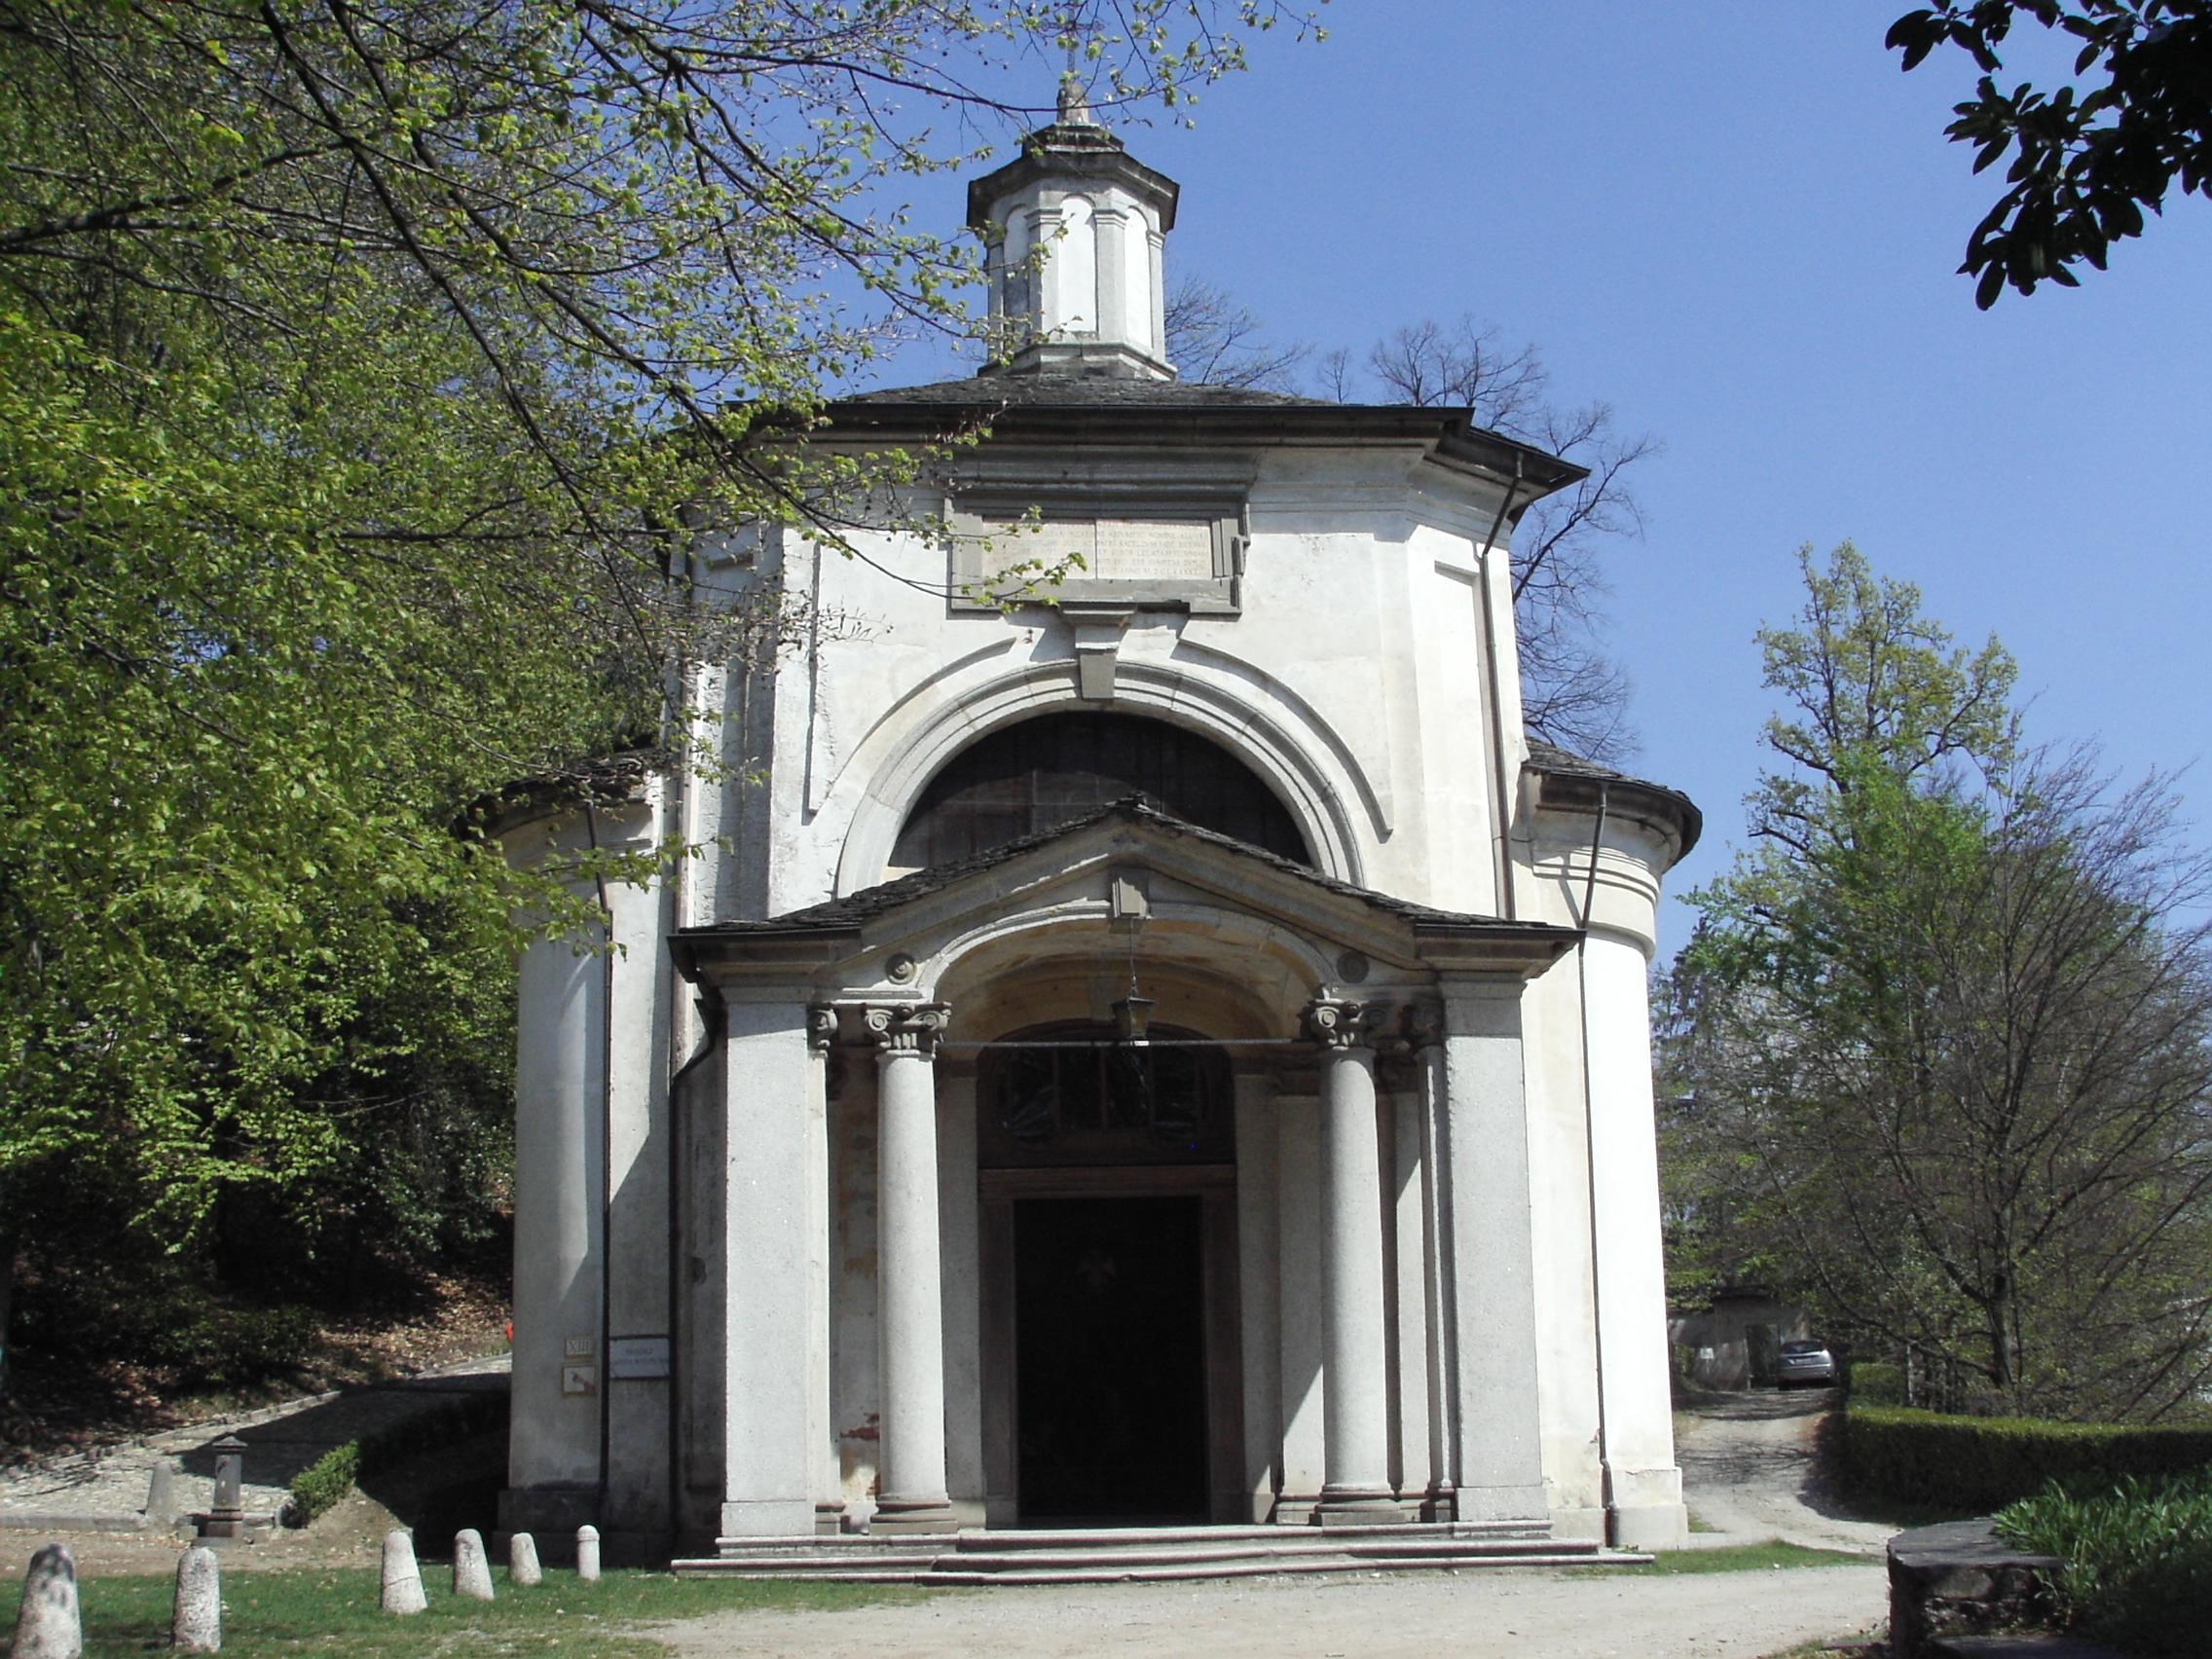 Orta – Sacro Monte (10)